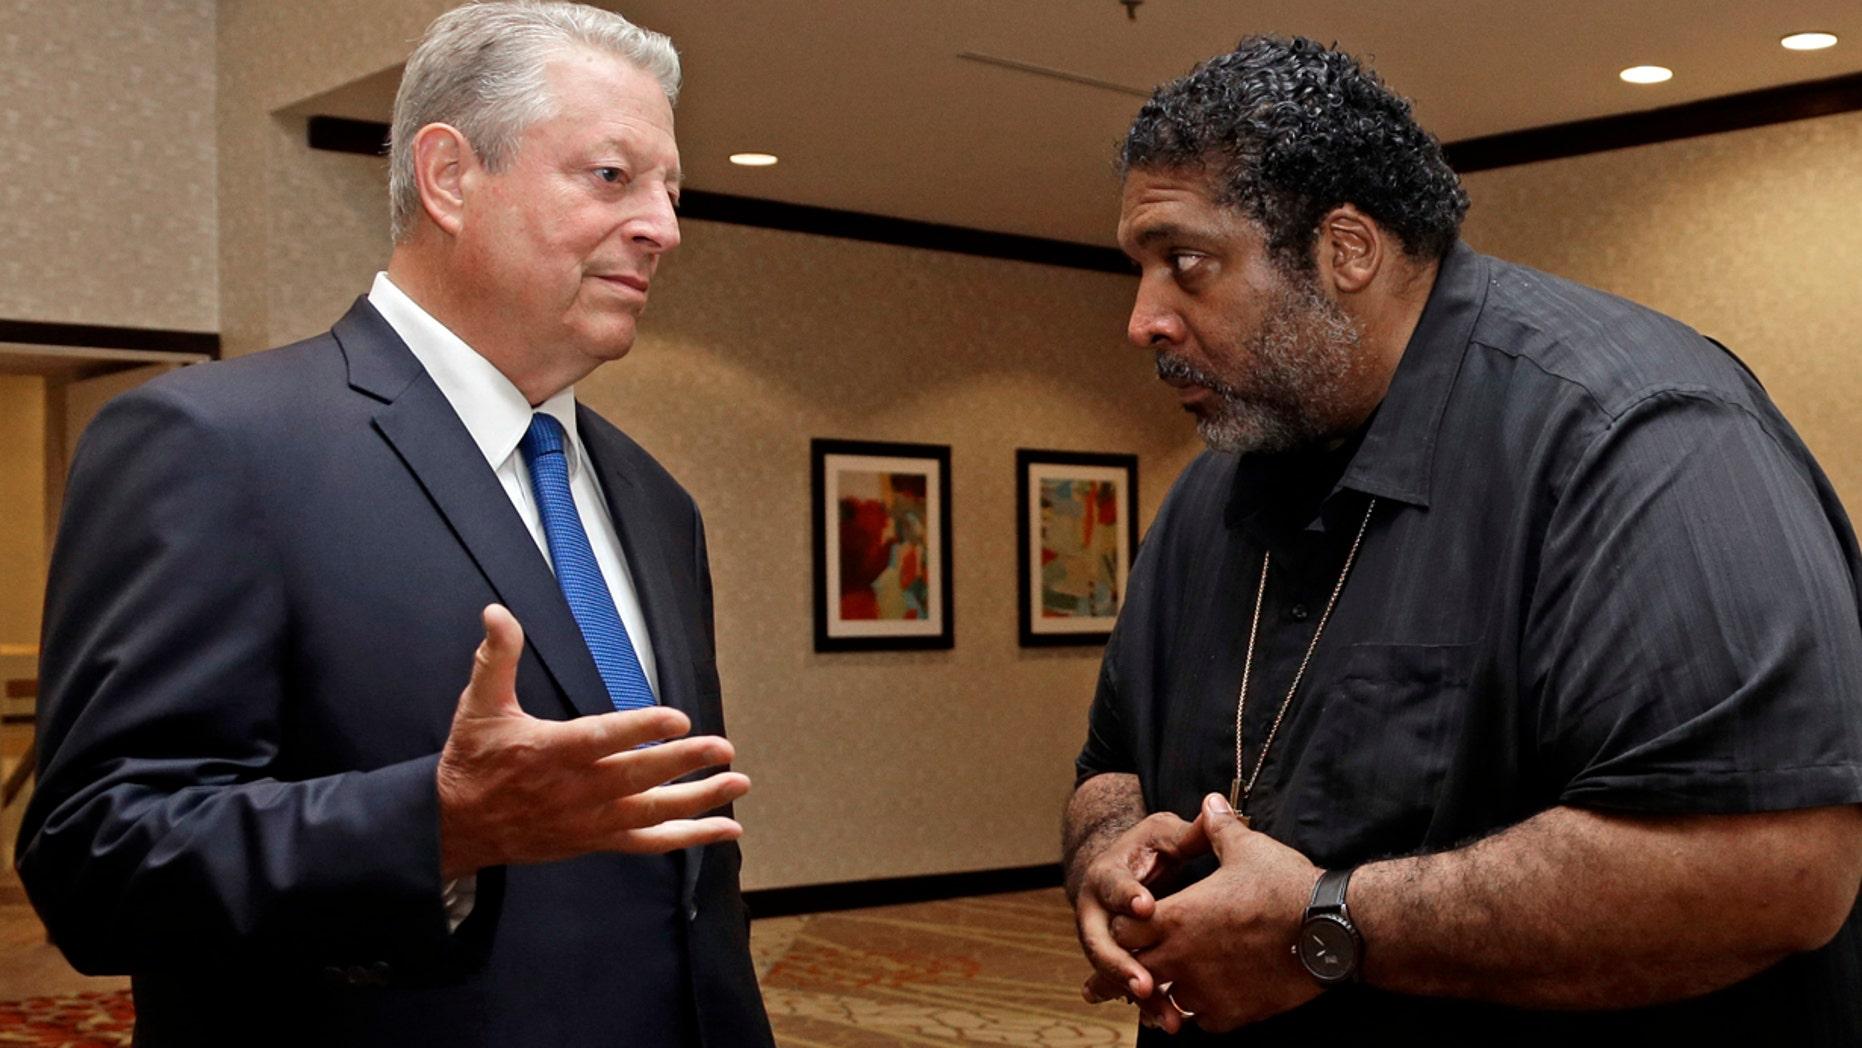 Former U.S. Vice President Al Gore, left, speaks with the Rev. Dr. William J. Barber II in Greensboro, N.C.